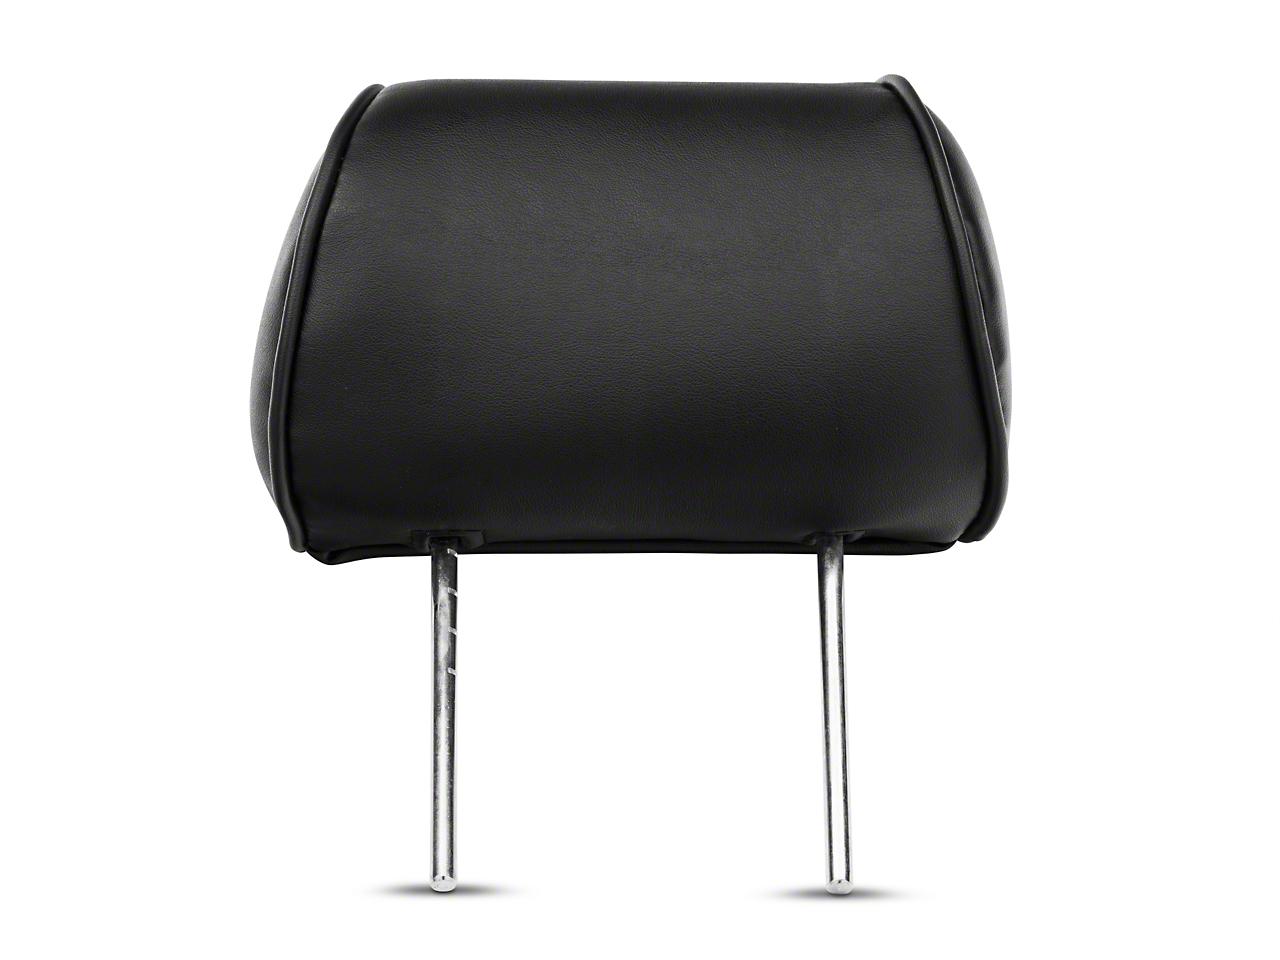 Corbeau Baja Bench Seat Headrest - Black Vinyl (87-18 Jeep Wrangler YJ, TJ, JK & JL)